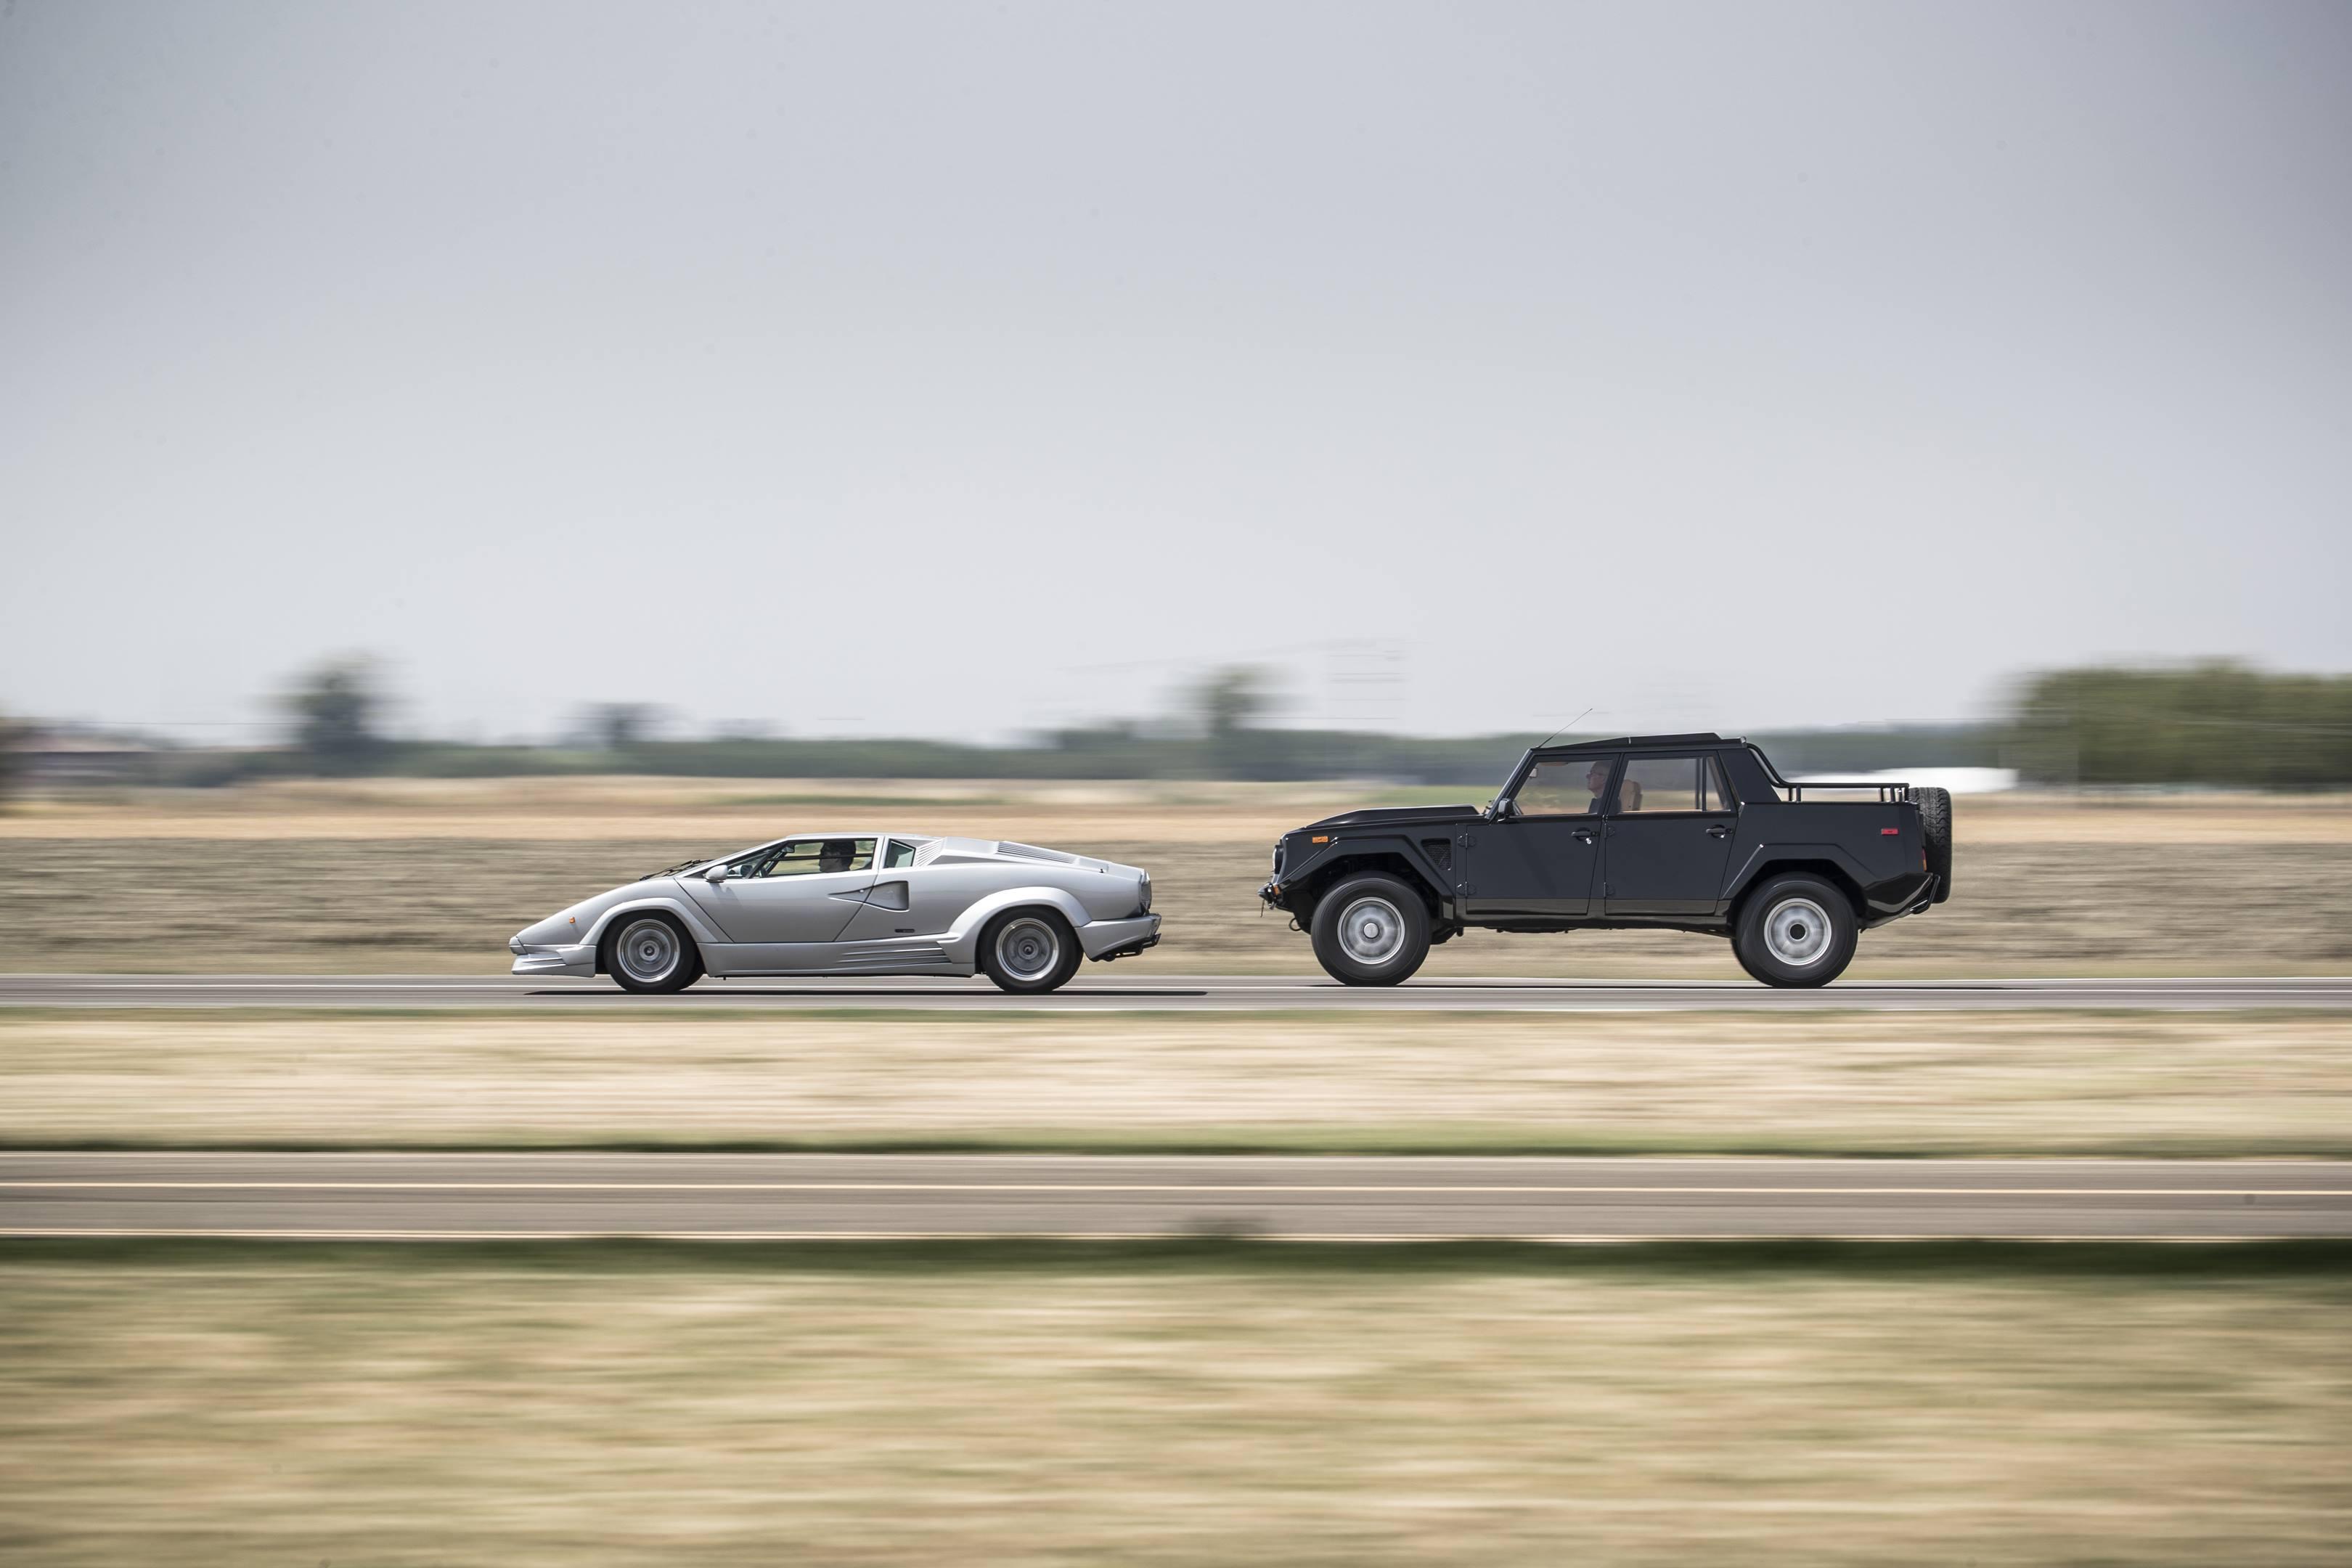 Lamborghini LM002 next to a Countach